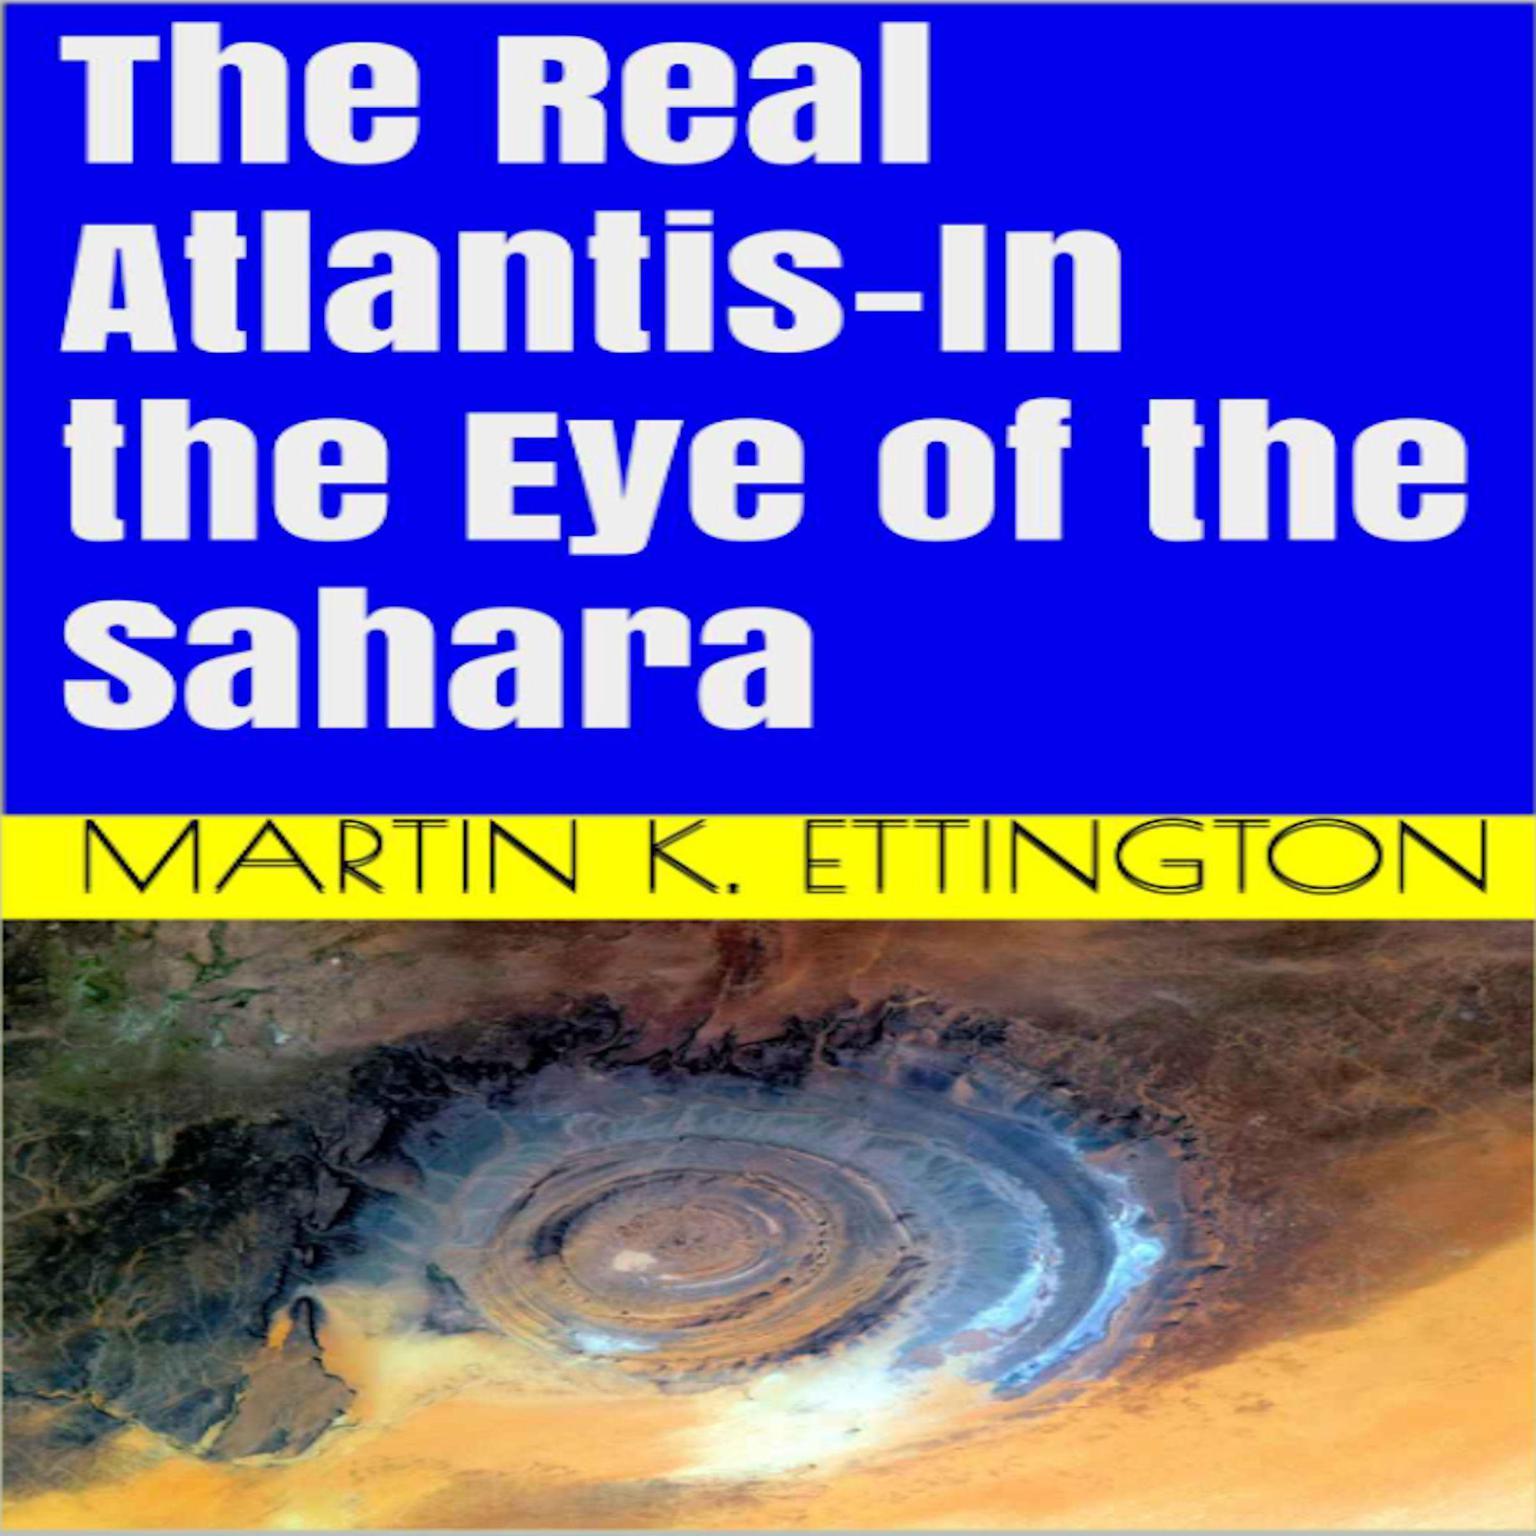 The Real Atlantis-In the Eye of the Sahara Audiobook, by Martin K. Ettington